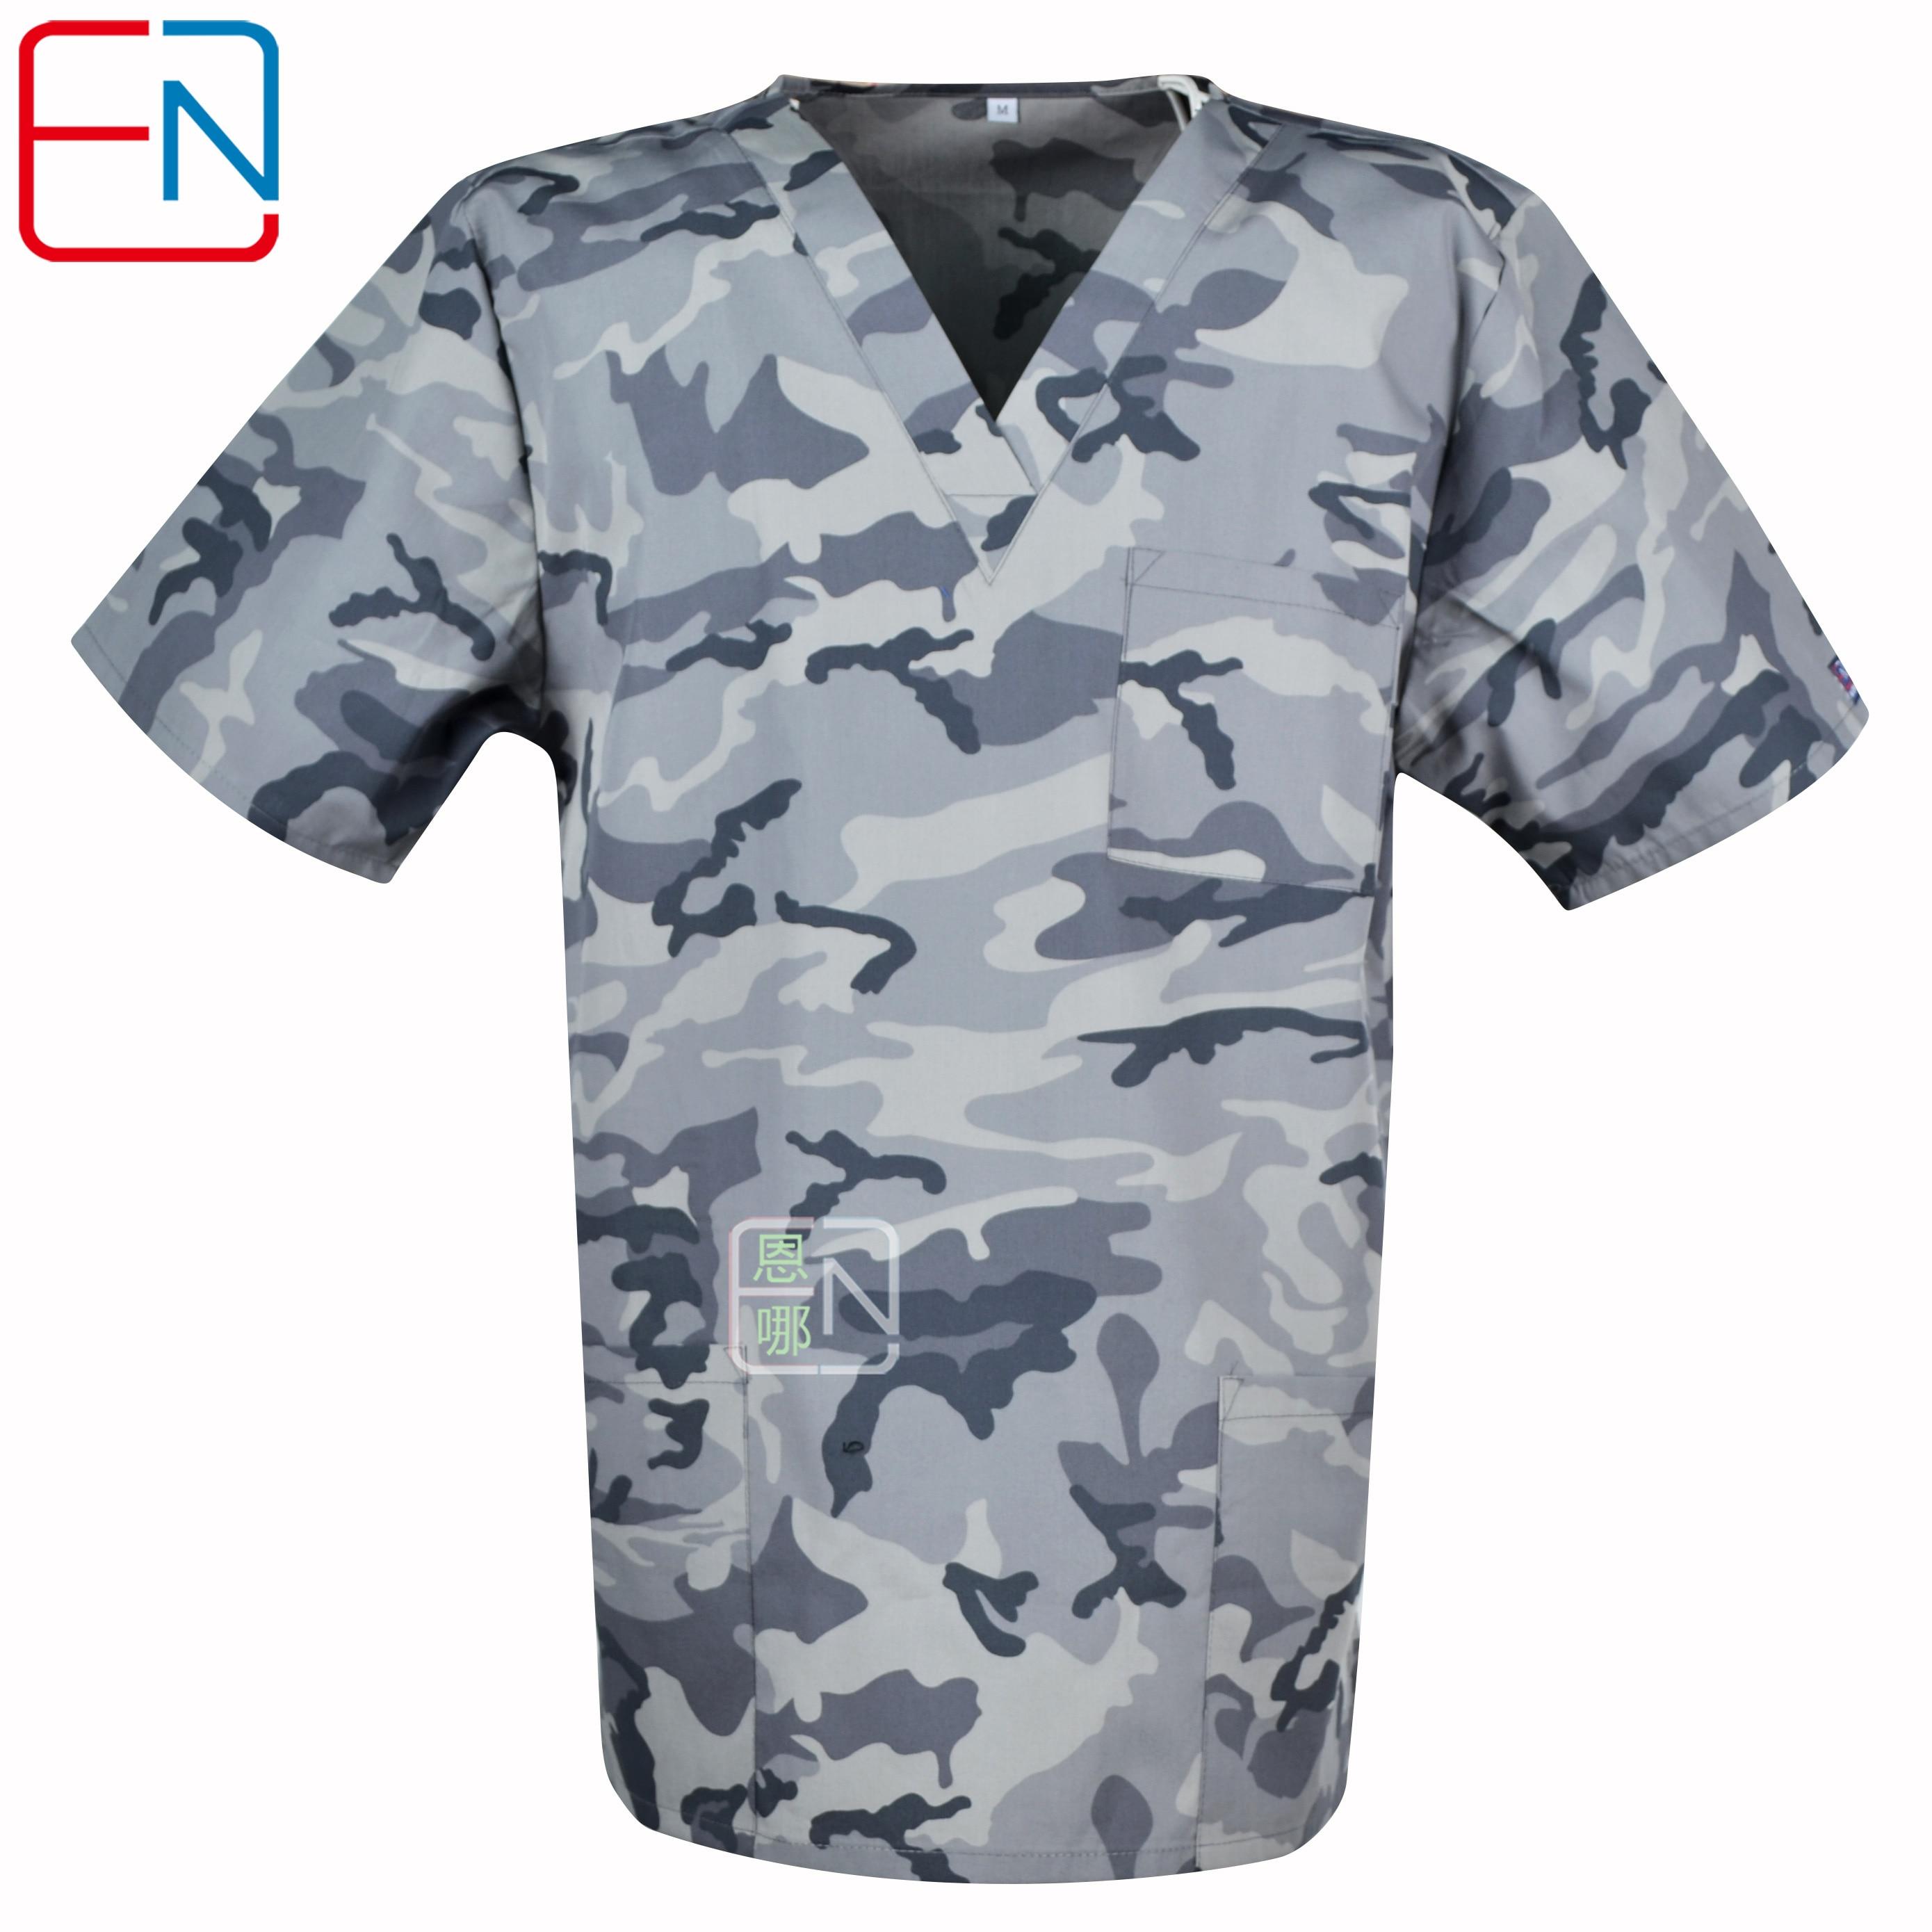 Men Medical Uniforms,men Scrub Top,men Medical Tops In Grey  Camouflage Medical Uniform For Male In 100% Cotton